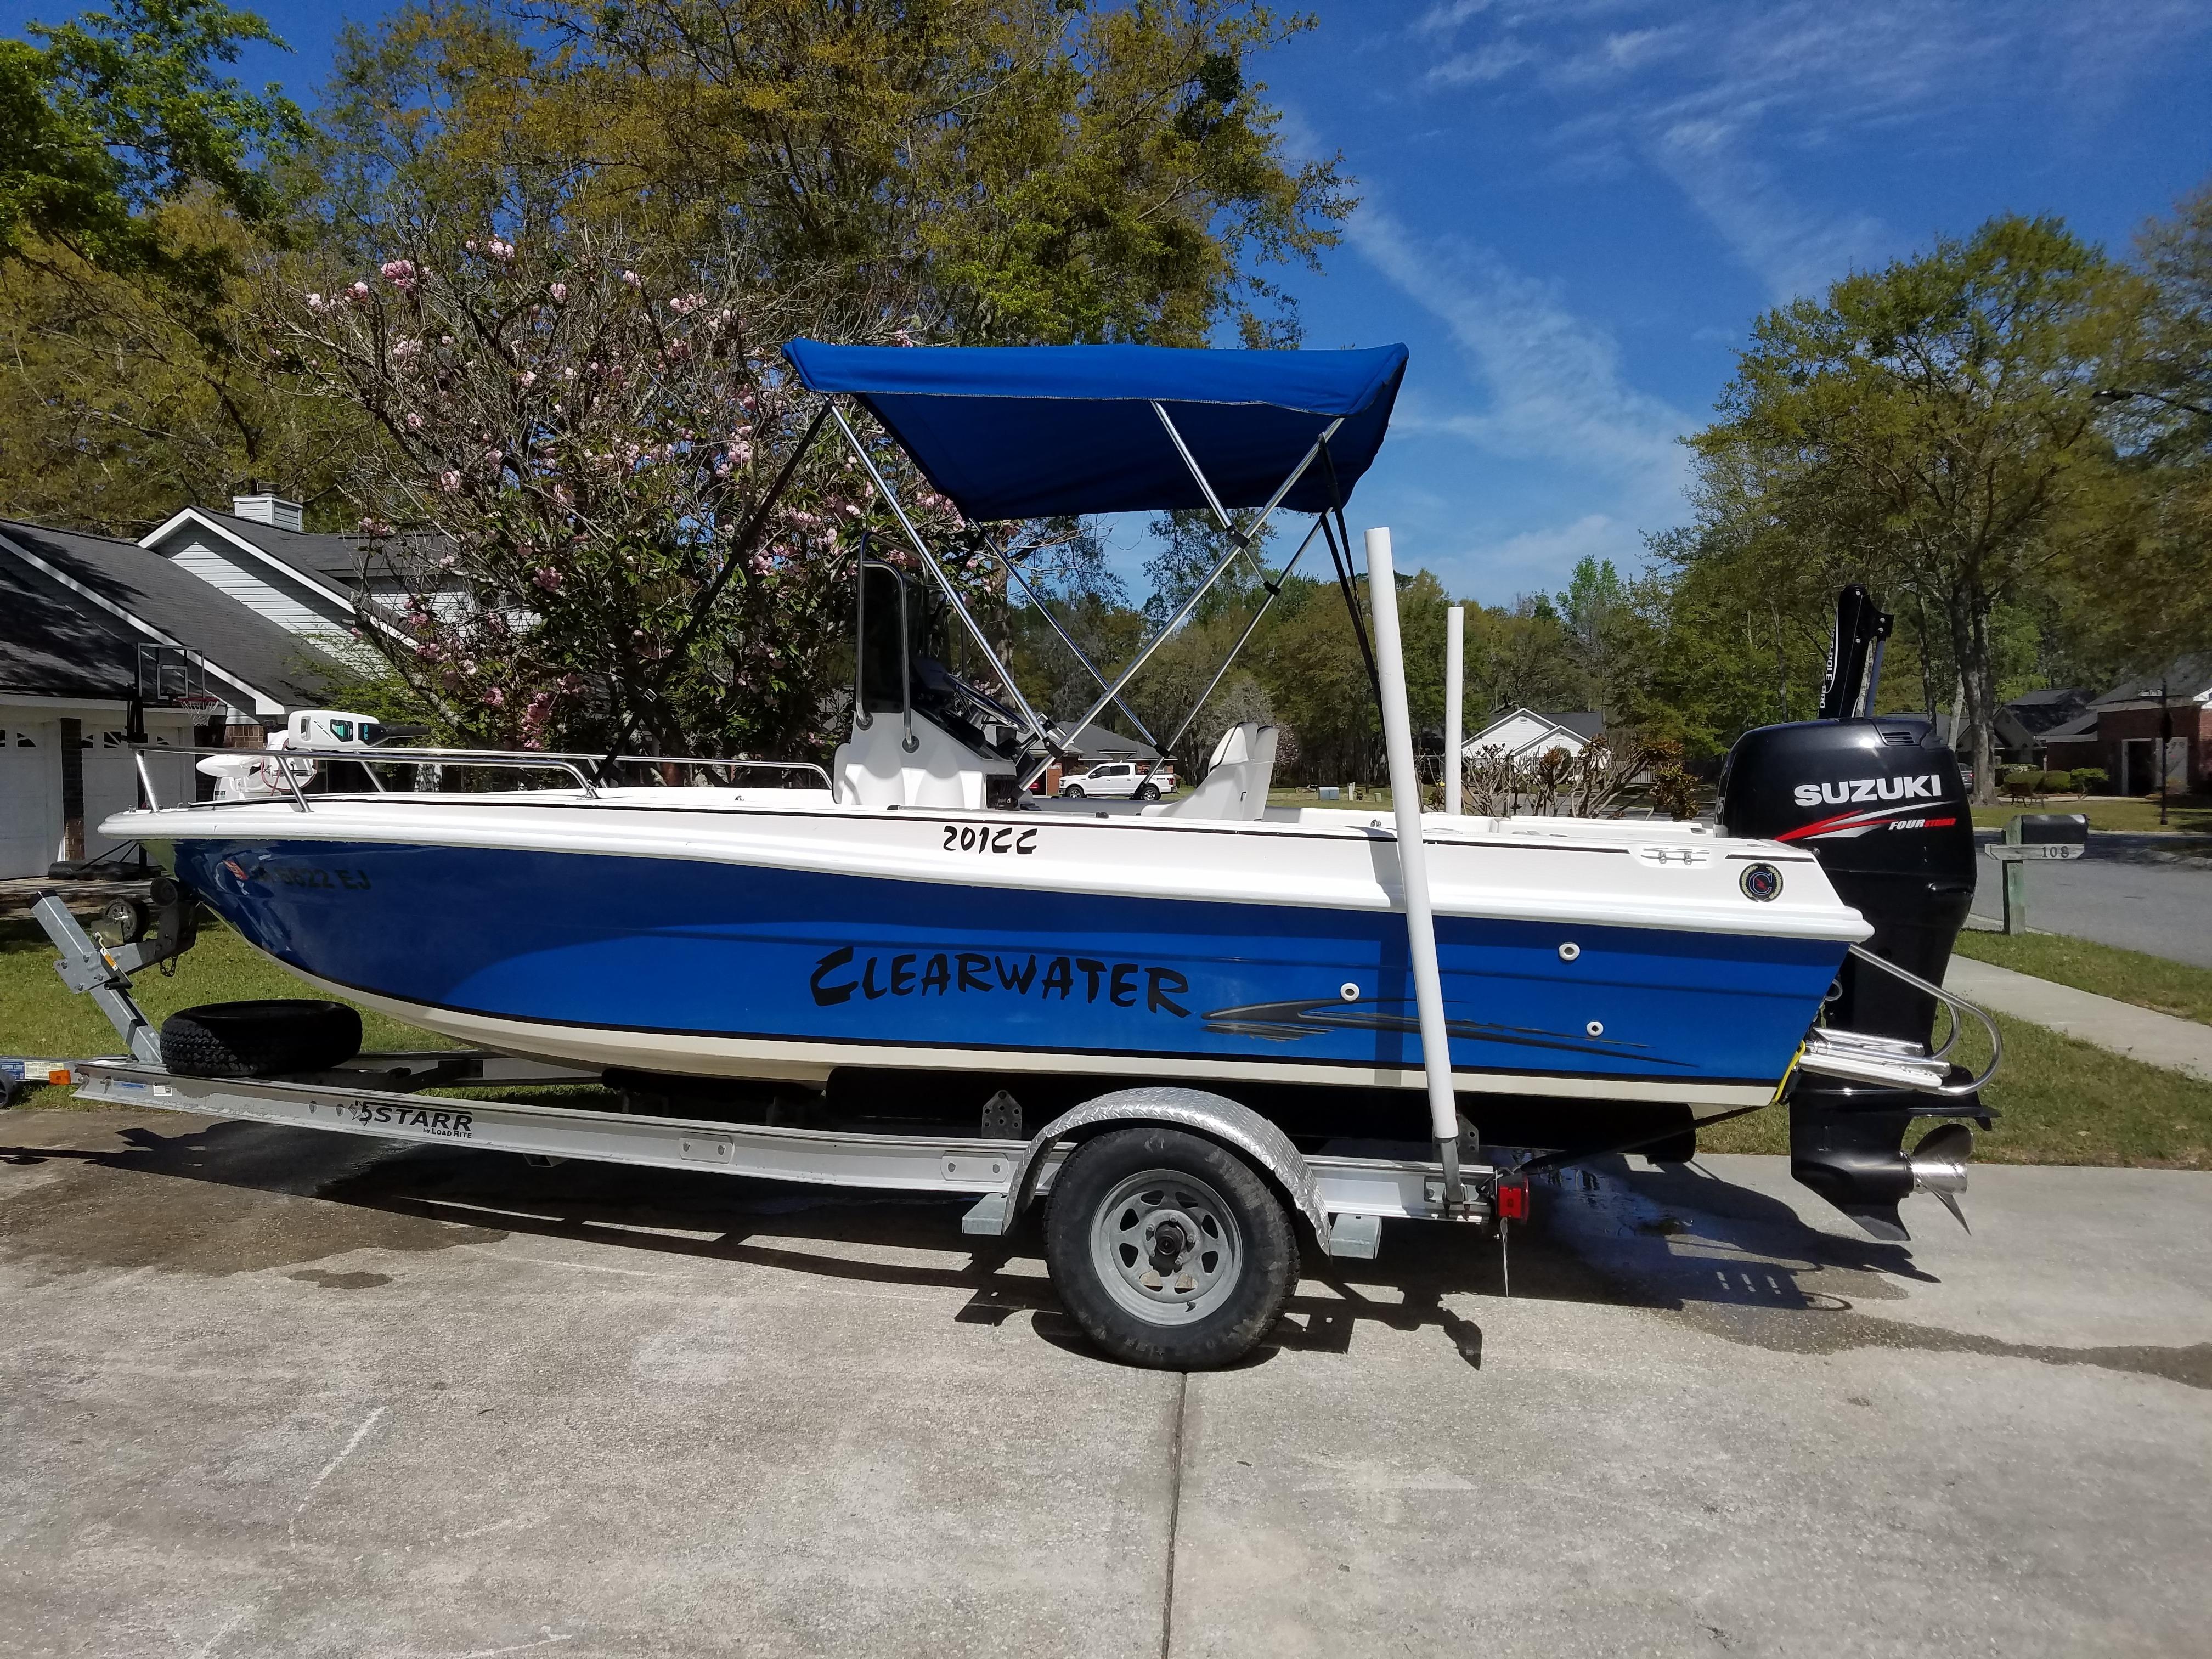 Used 2002 Clearwater 201cc Savannah Ga BoatTrader